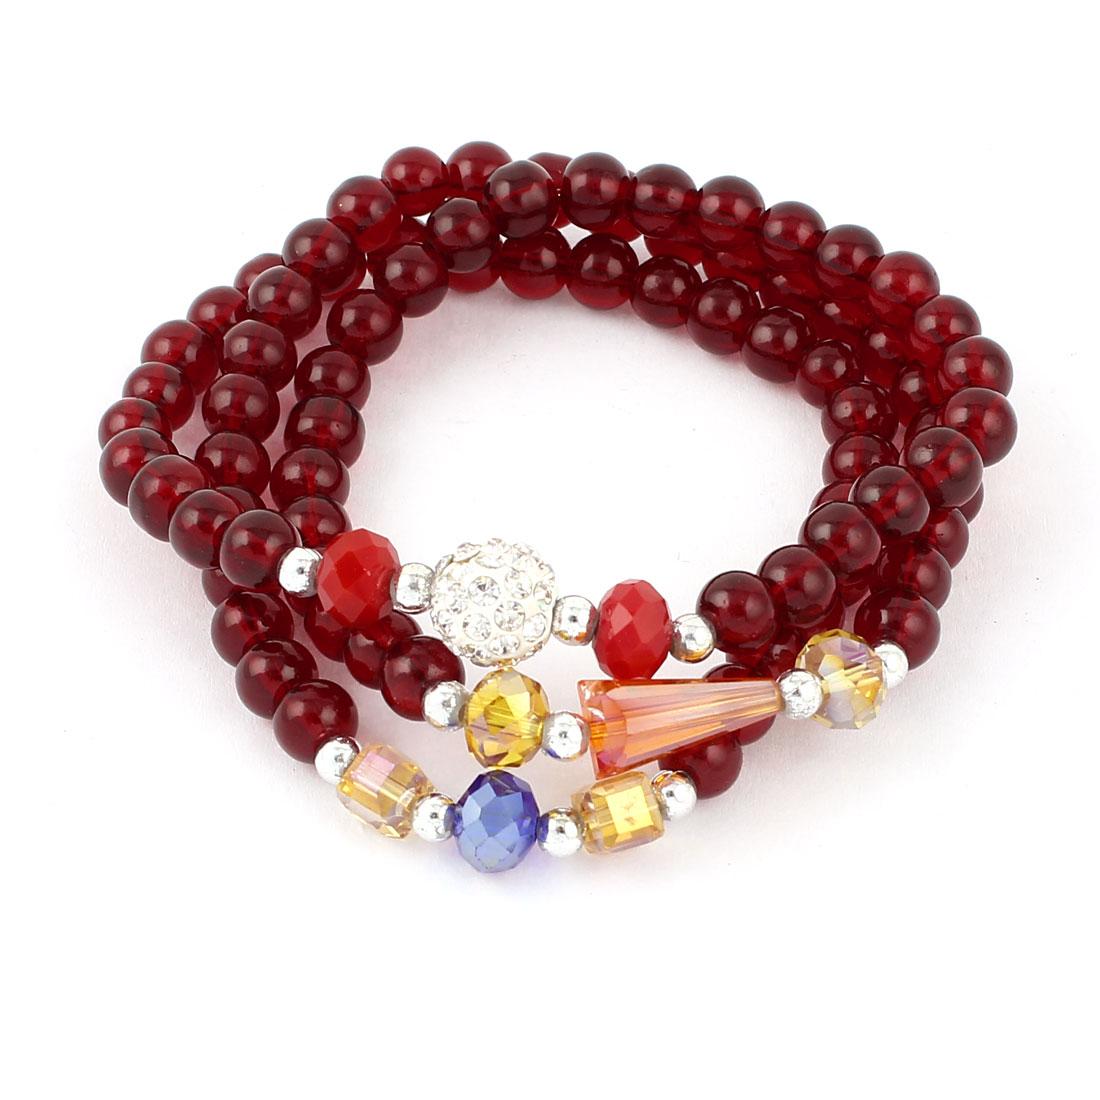 Lady Plastic Crystal Decor Bead Linked Necklace Bracelet Carmine